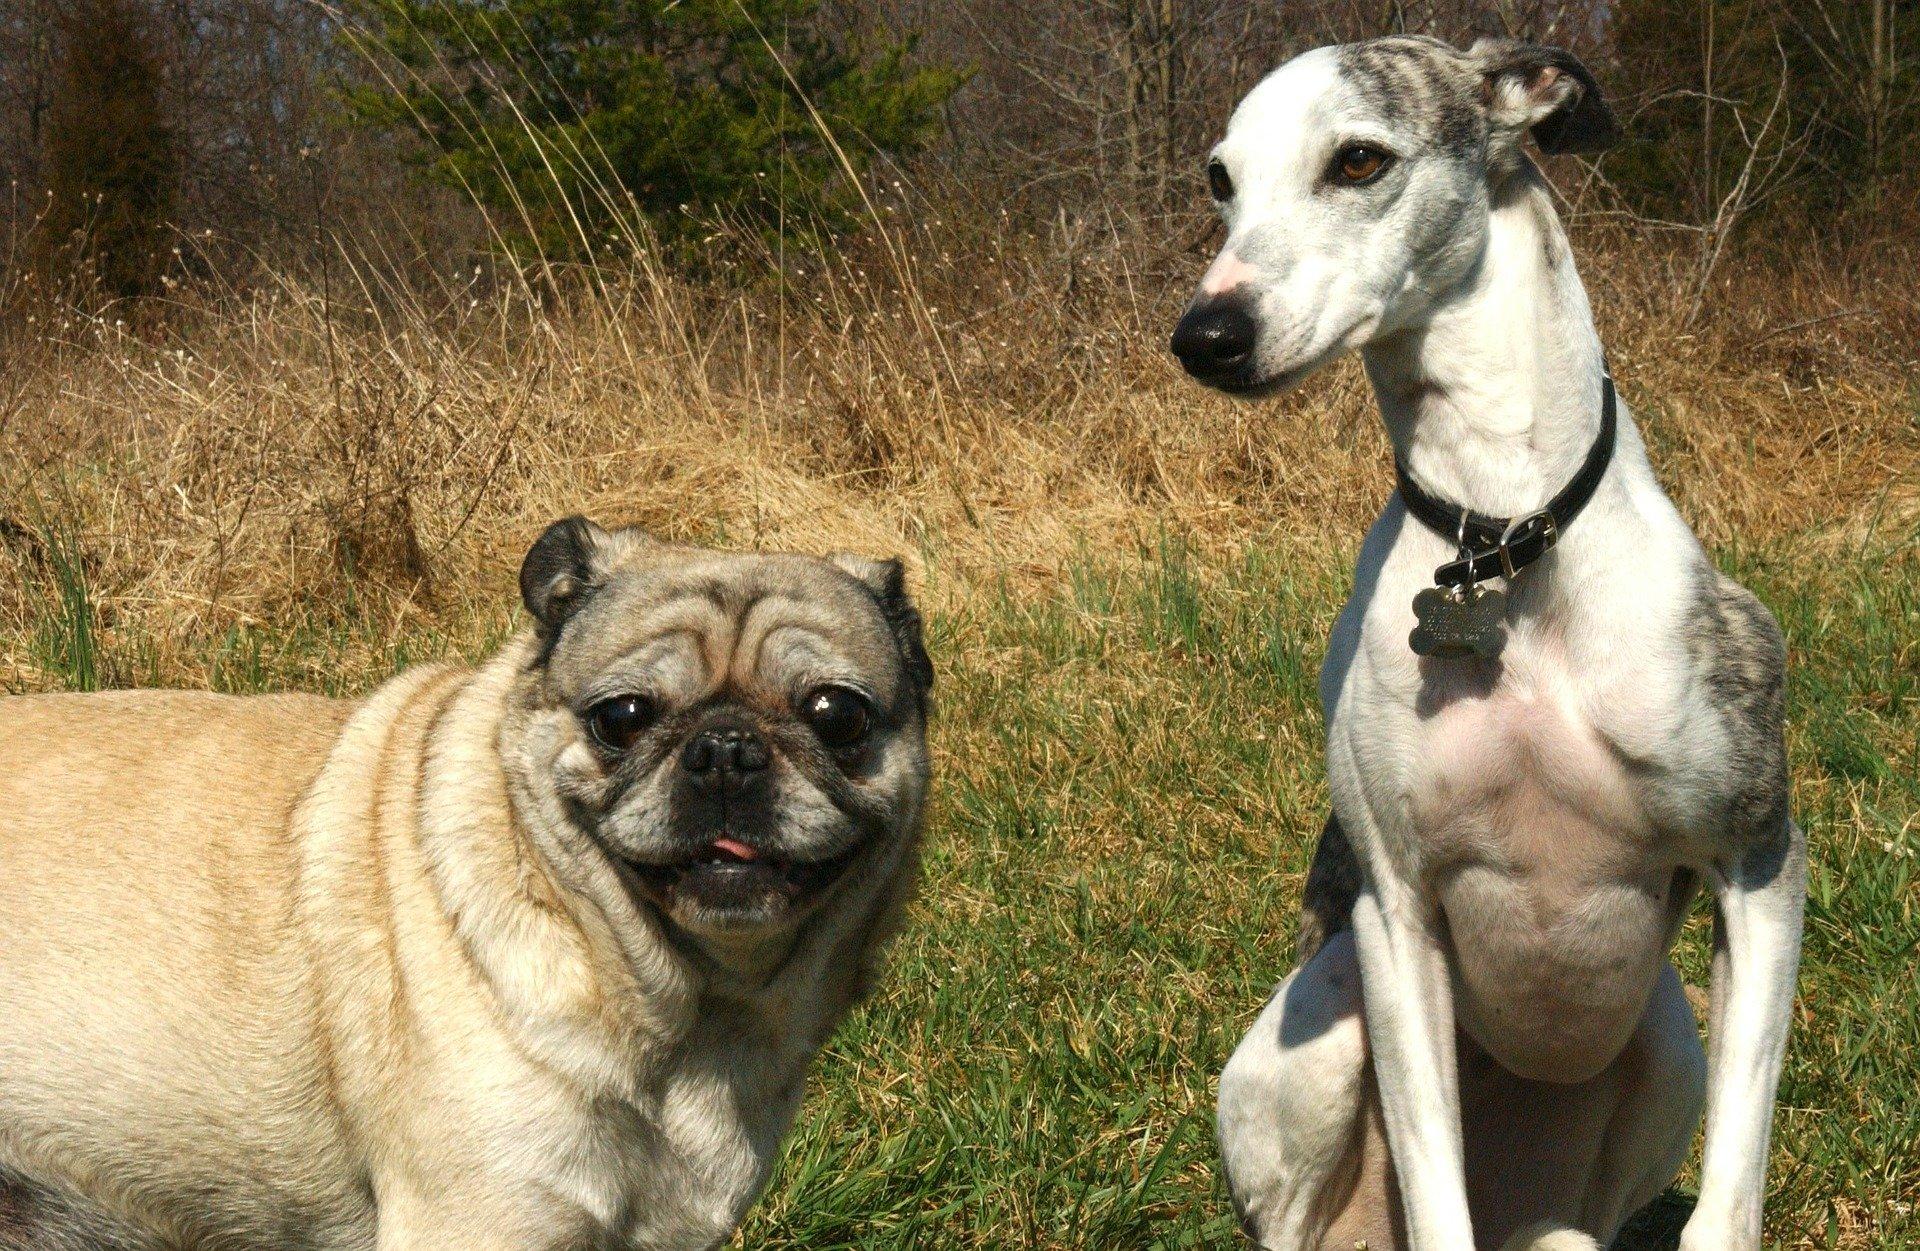 Duo canino